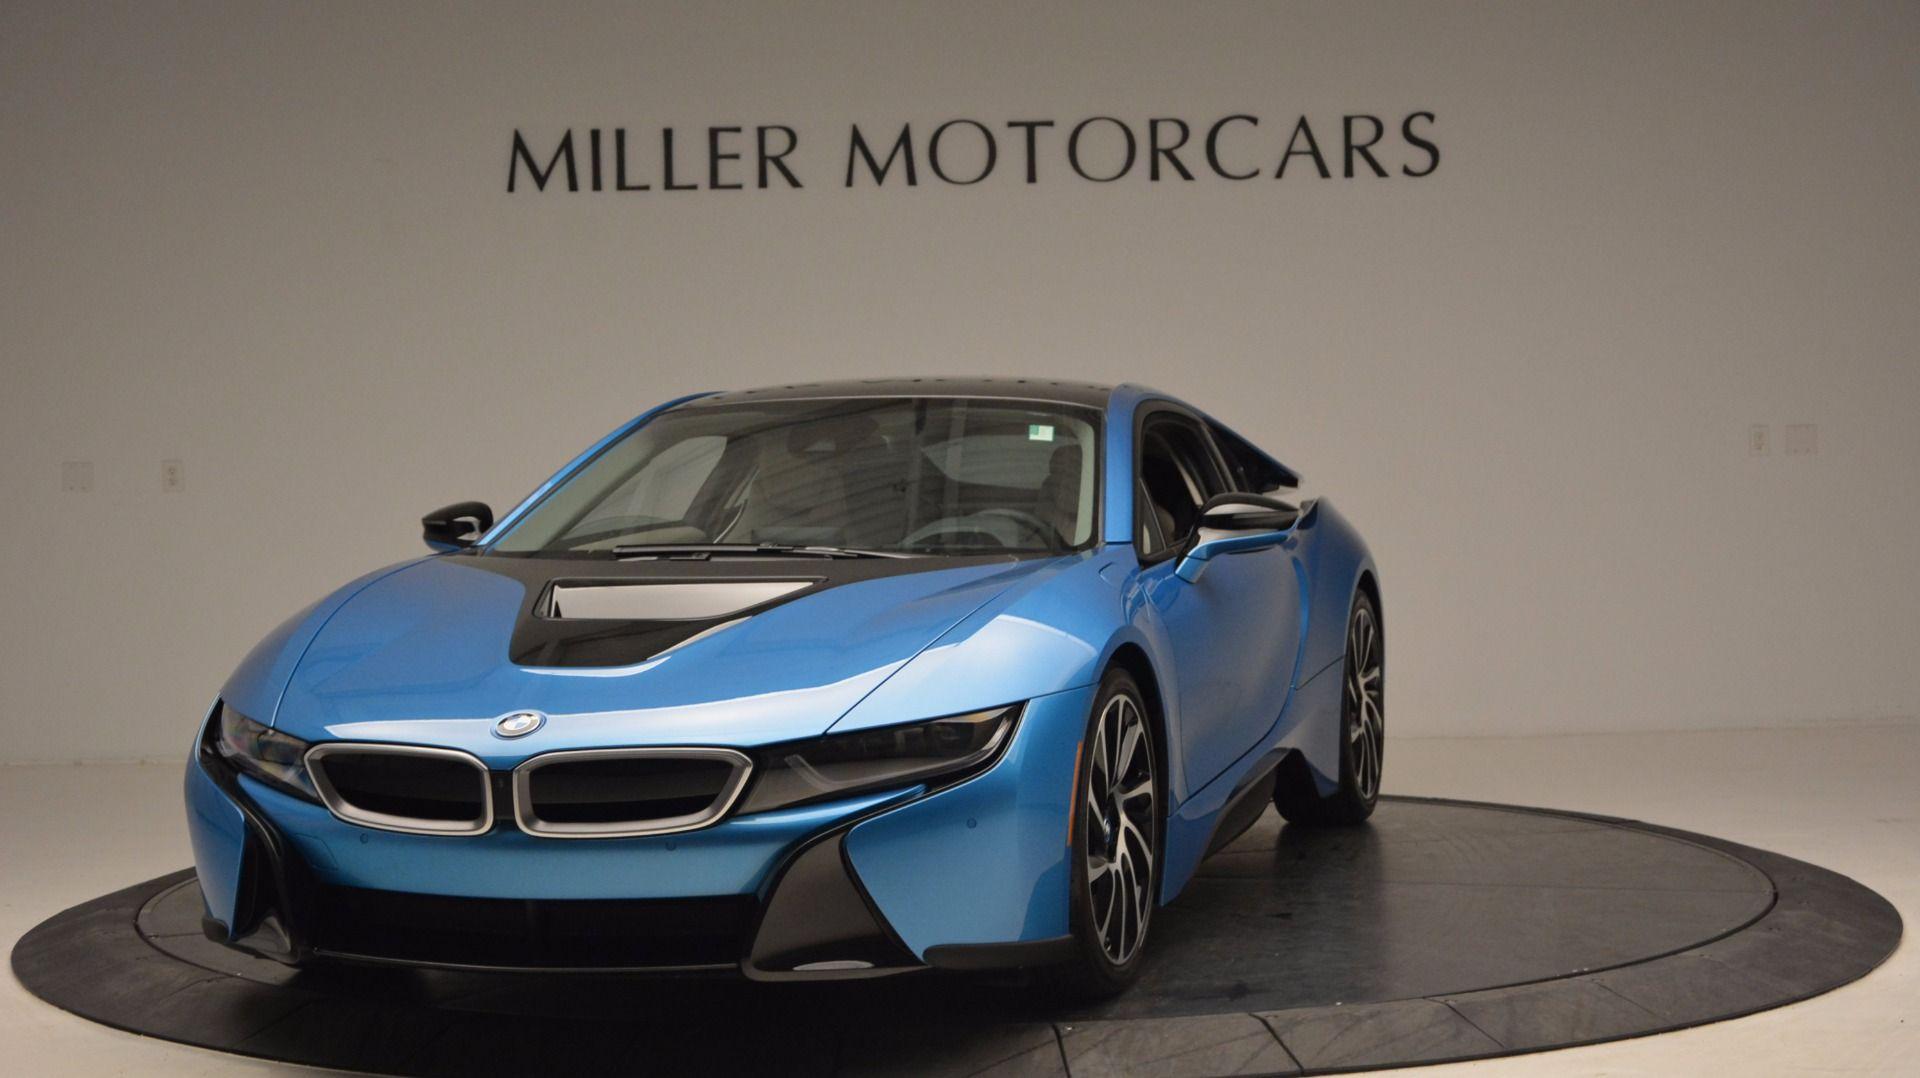 Used 2015 BMW i8 Giga World Greenwich, CT Bmw, Bmw